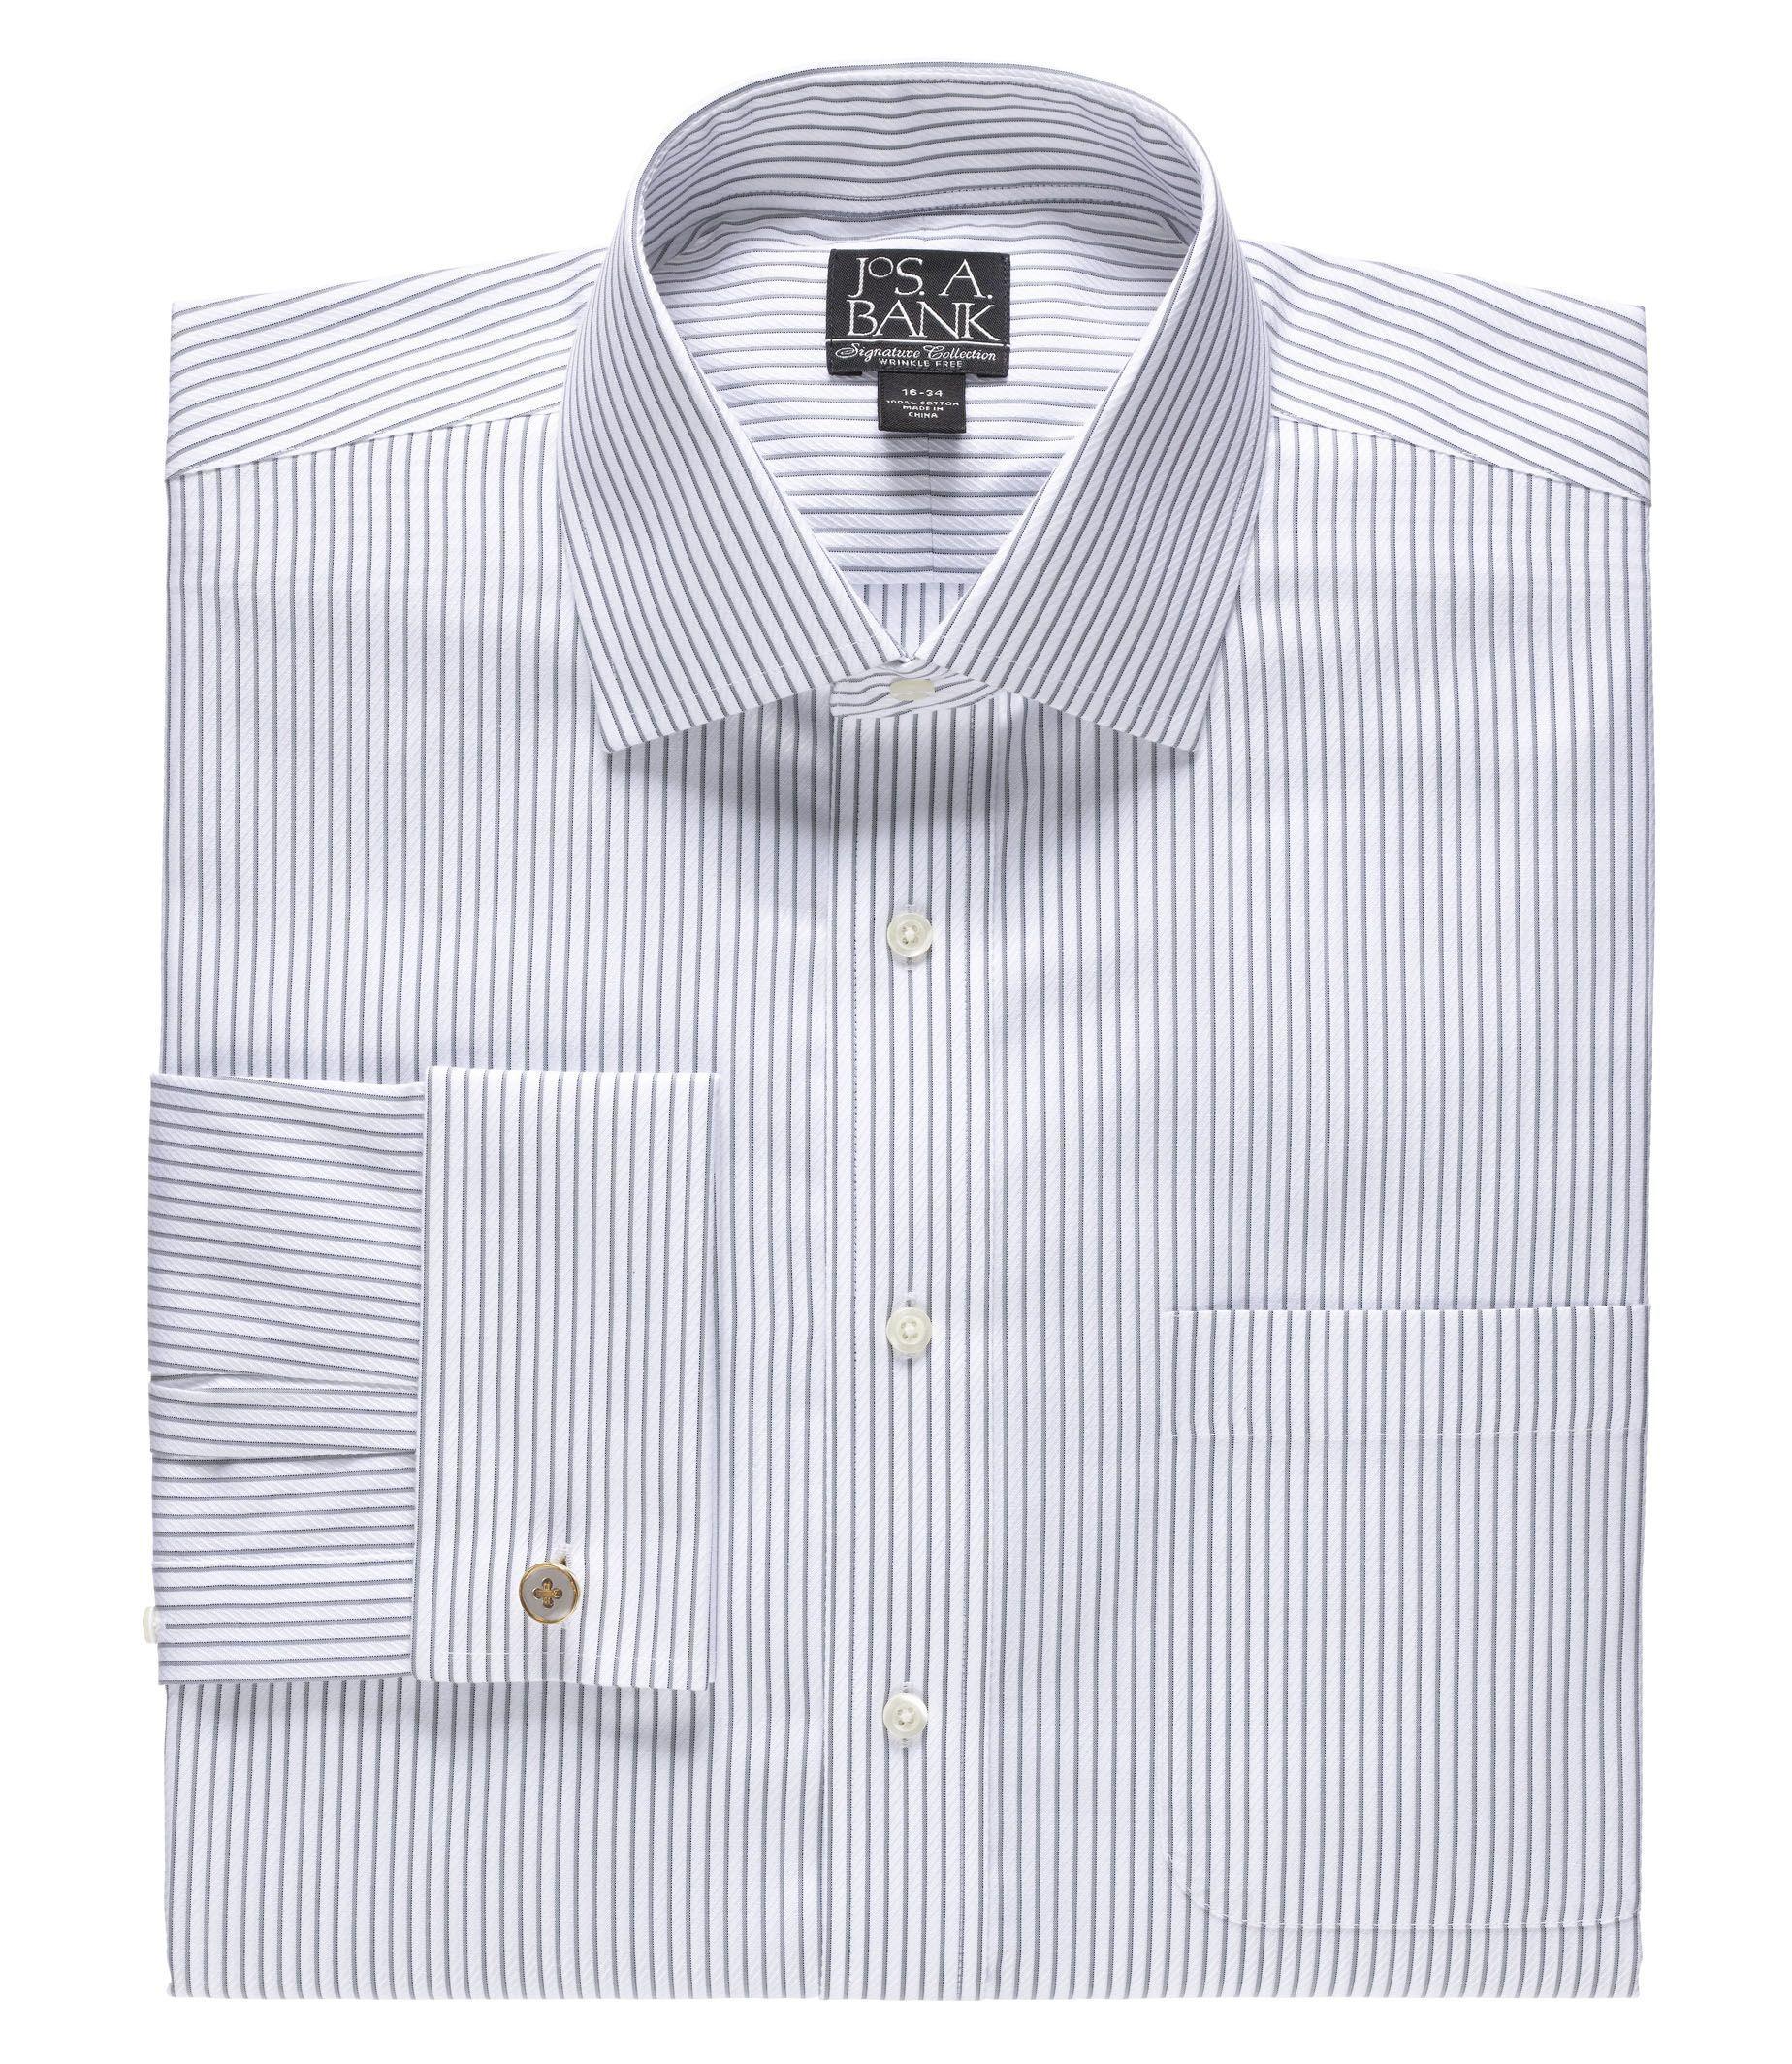 Signature Spread Collar French Cuff Dress Shirt